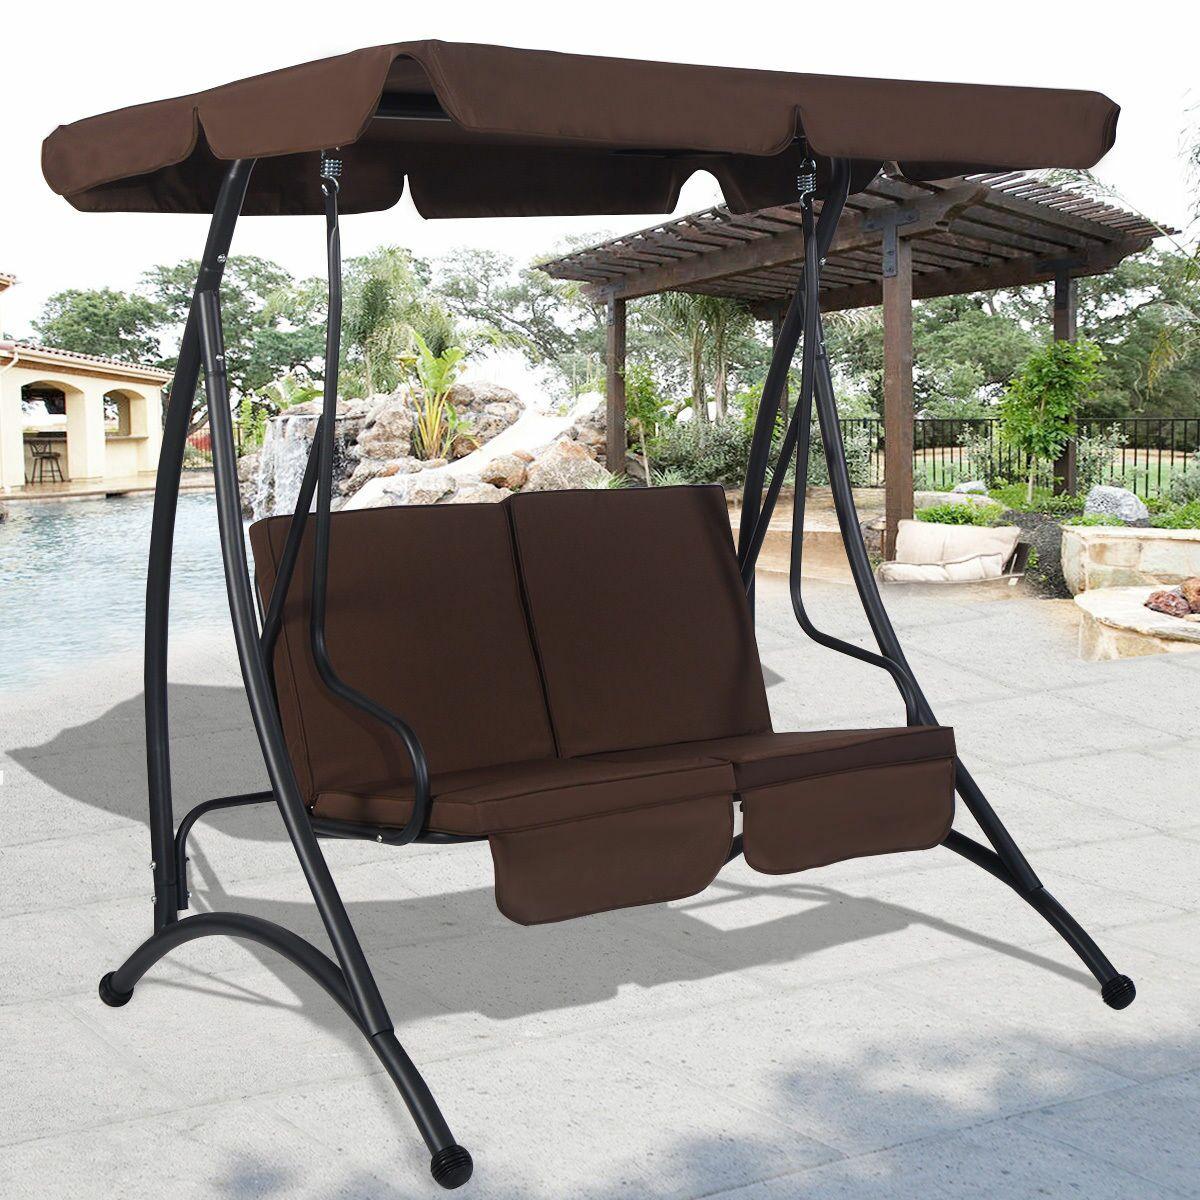 Reagle 2 Person Porch Swing Canopy Fabric: Brown